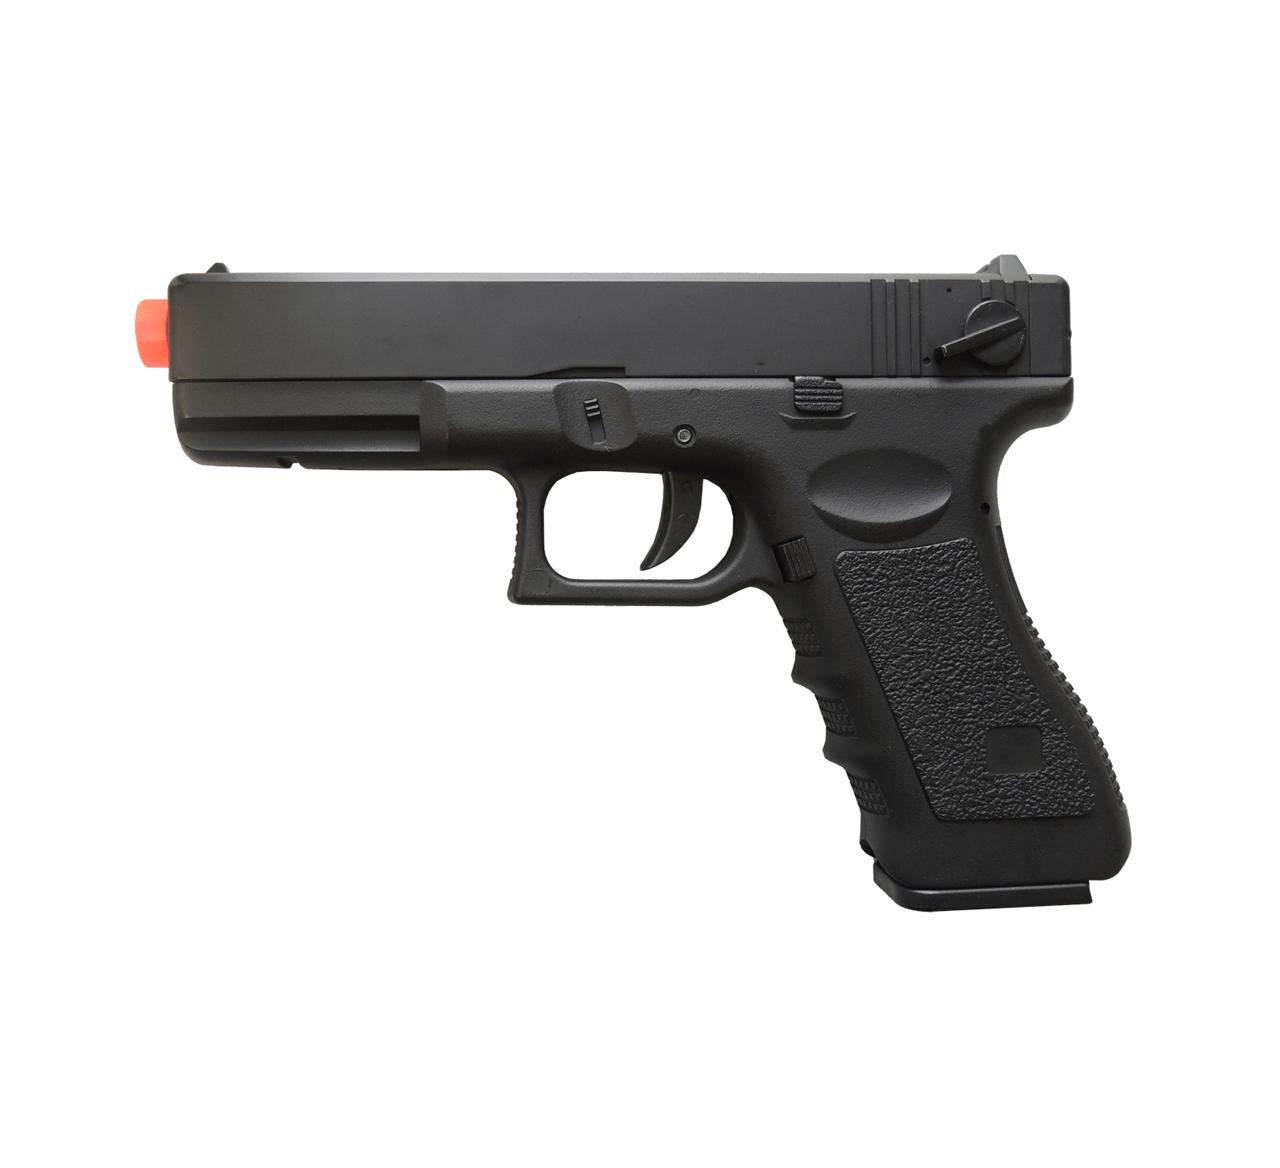 Pistola de Airsoft elétrica AEP Glock 18C CM030 Cyma 6mm